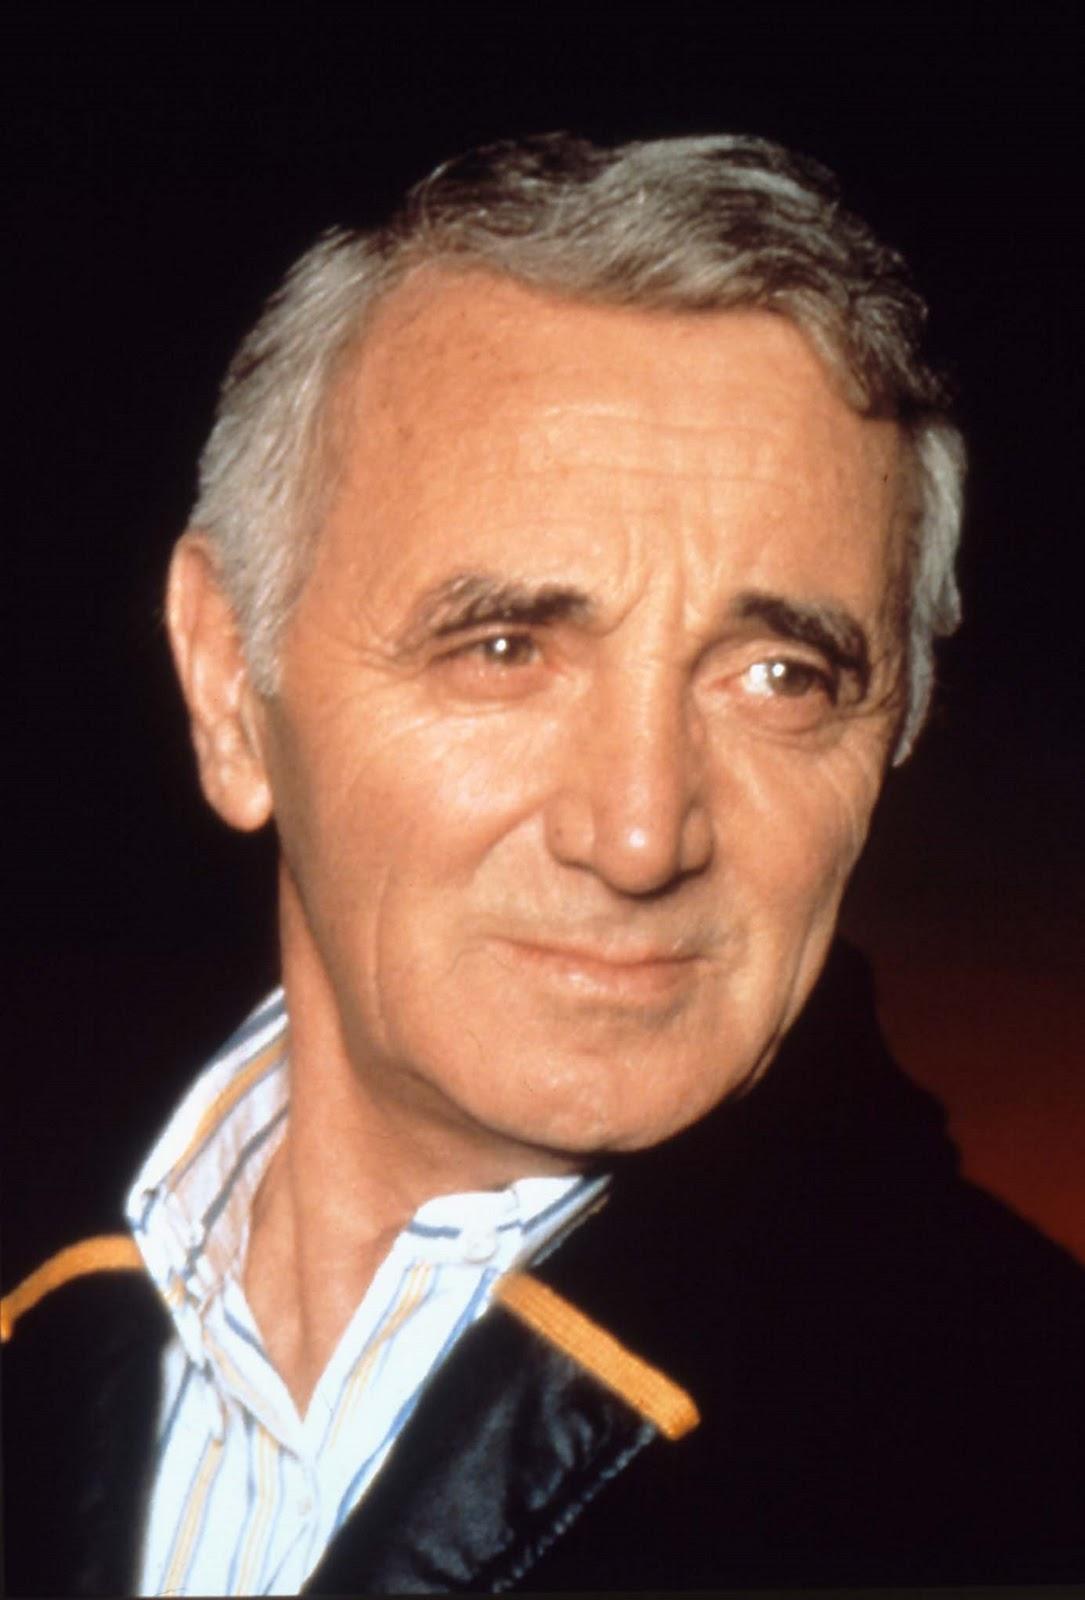 Charles Aznavour - Charles Aznavour & The Clayton Hamilton Jazz Orchestra